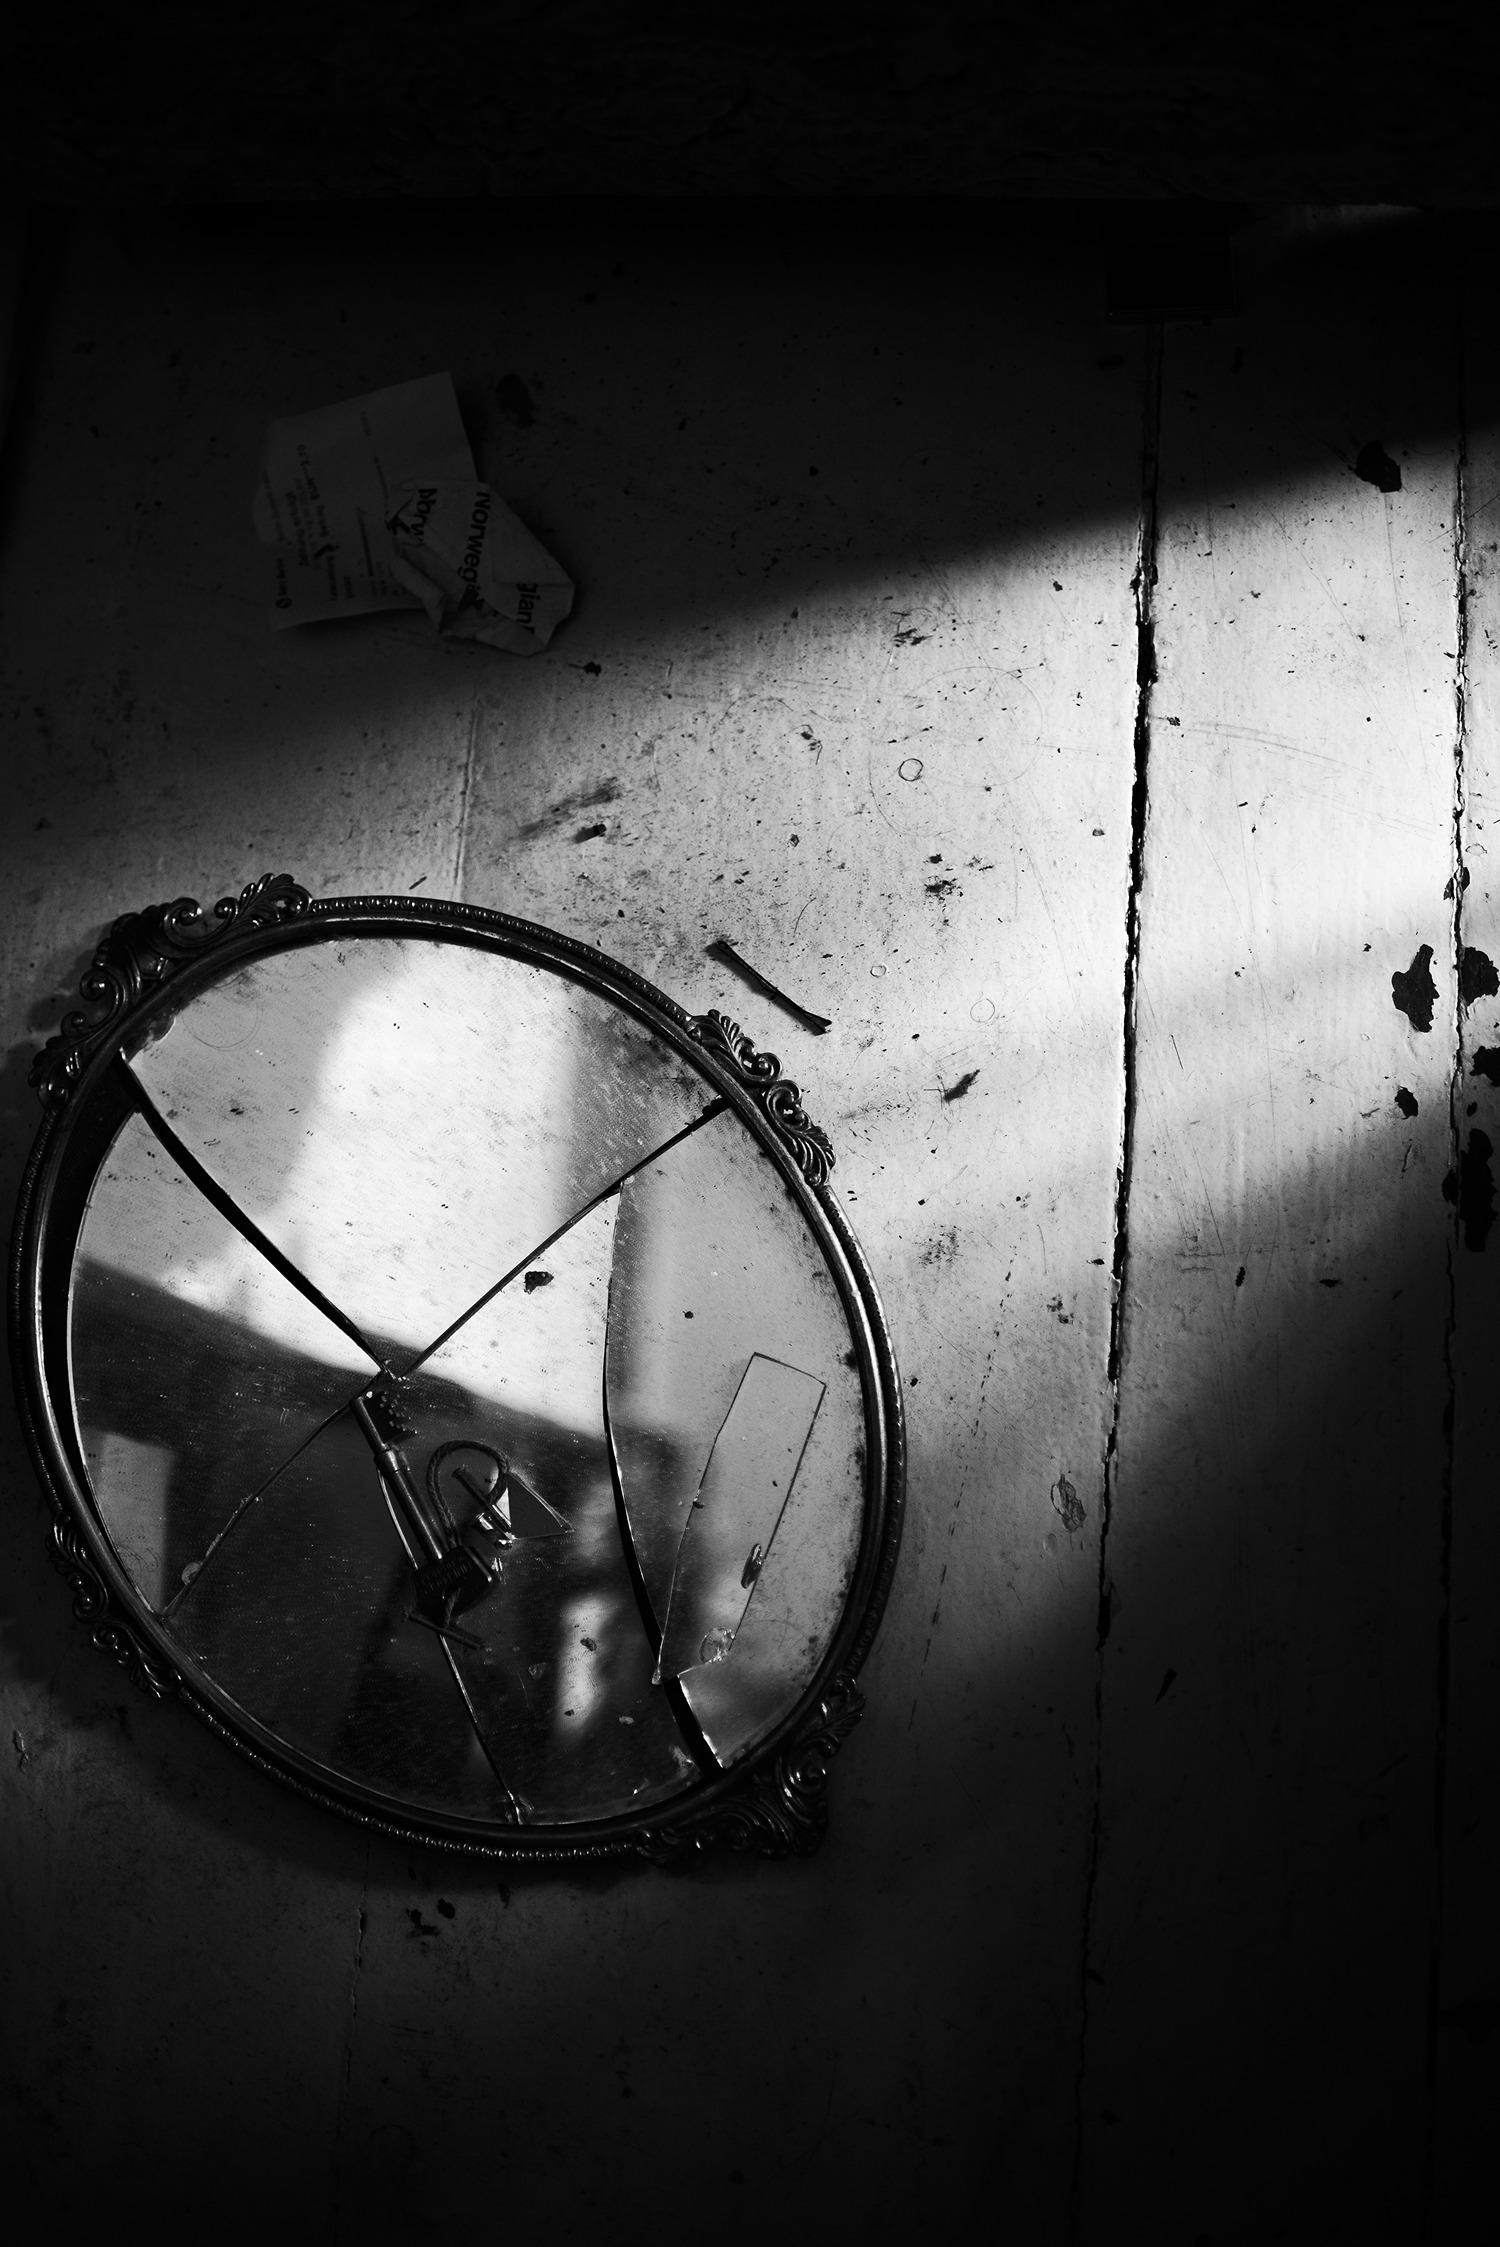 Broken mirror, Berlin, 2016